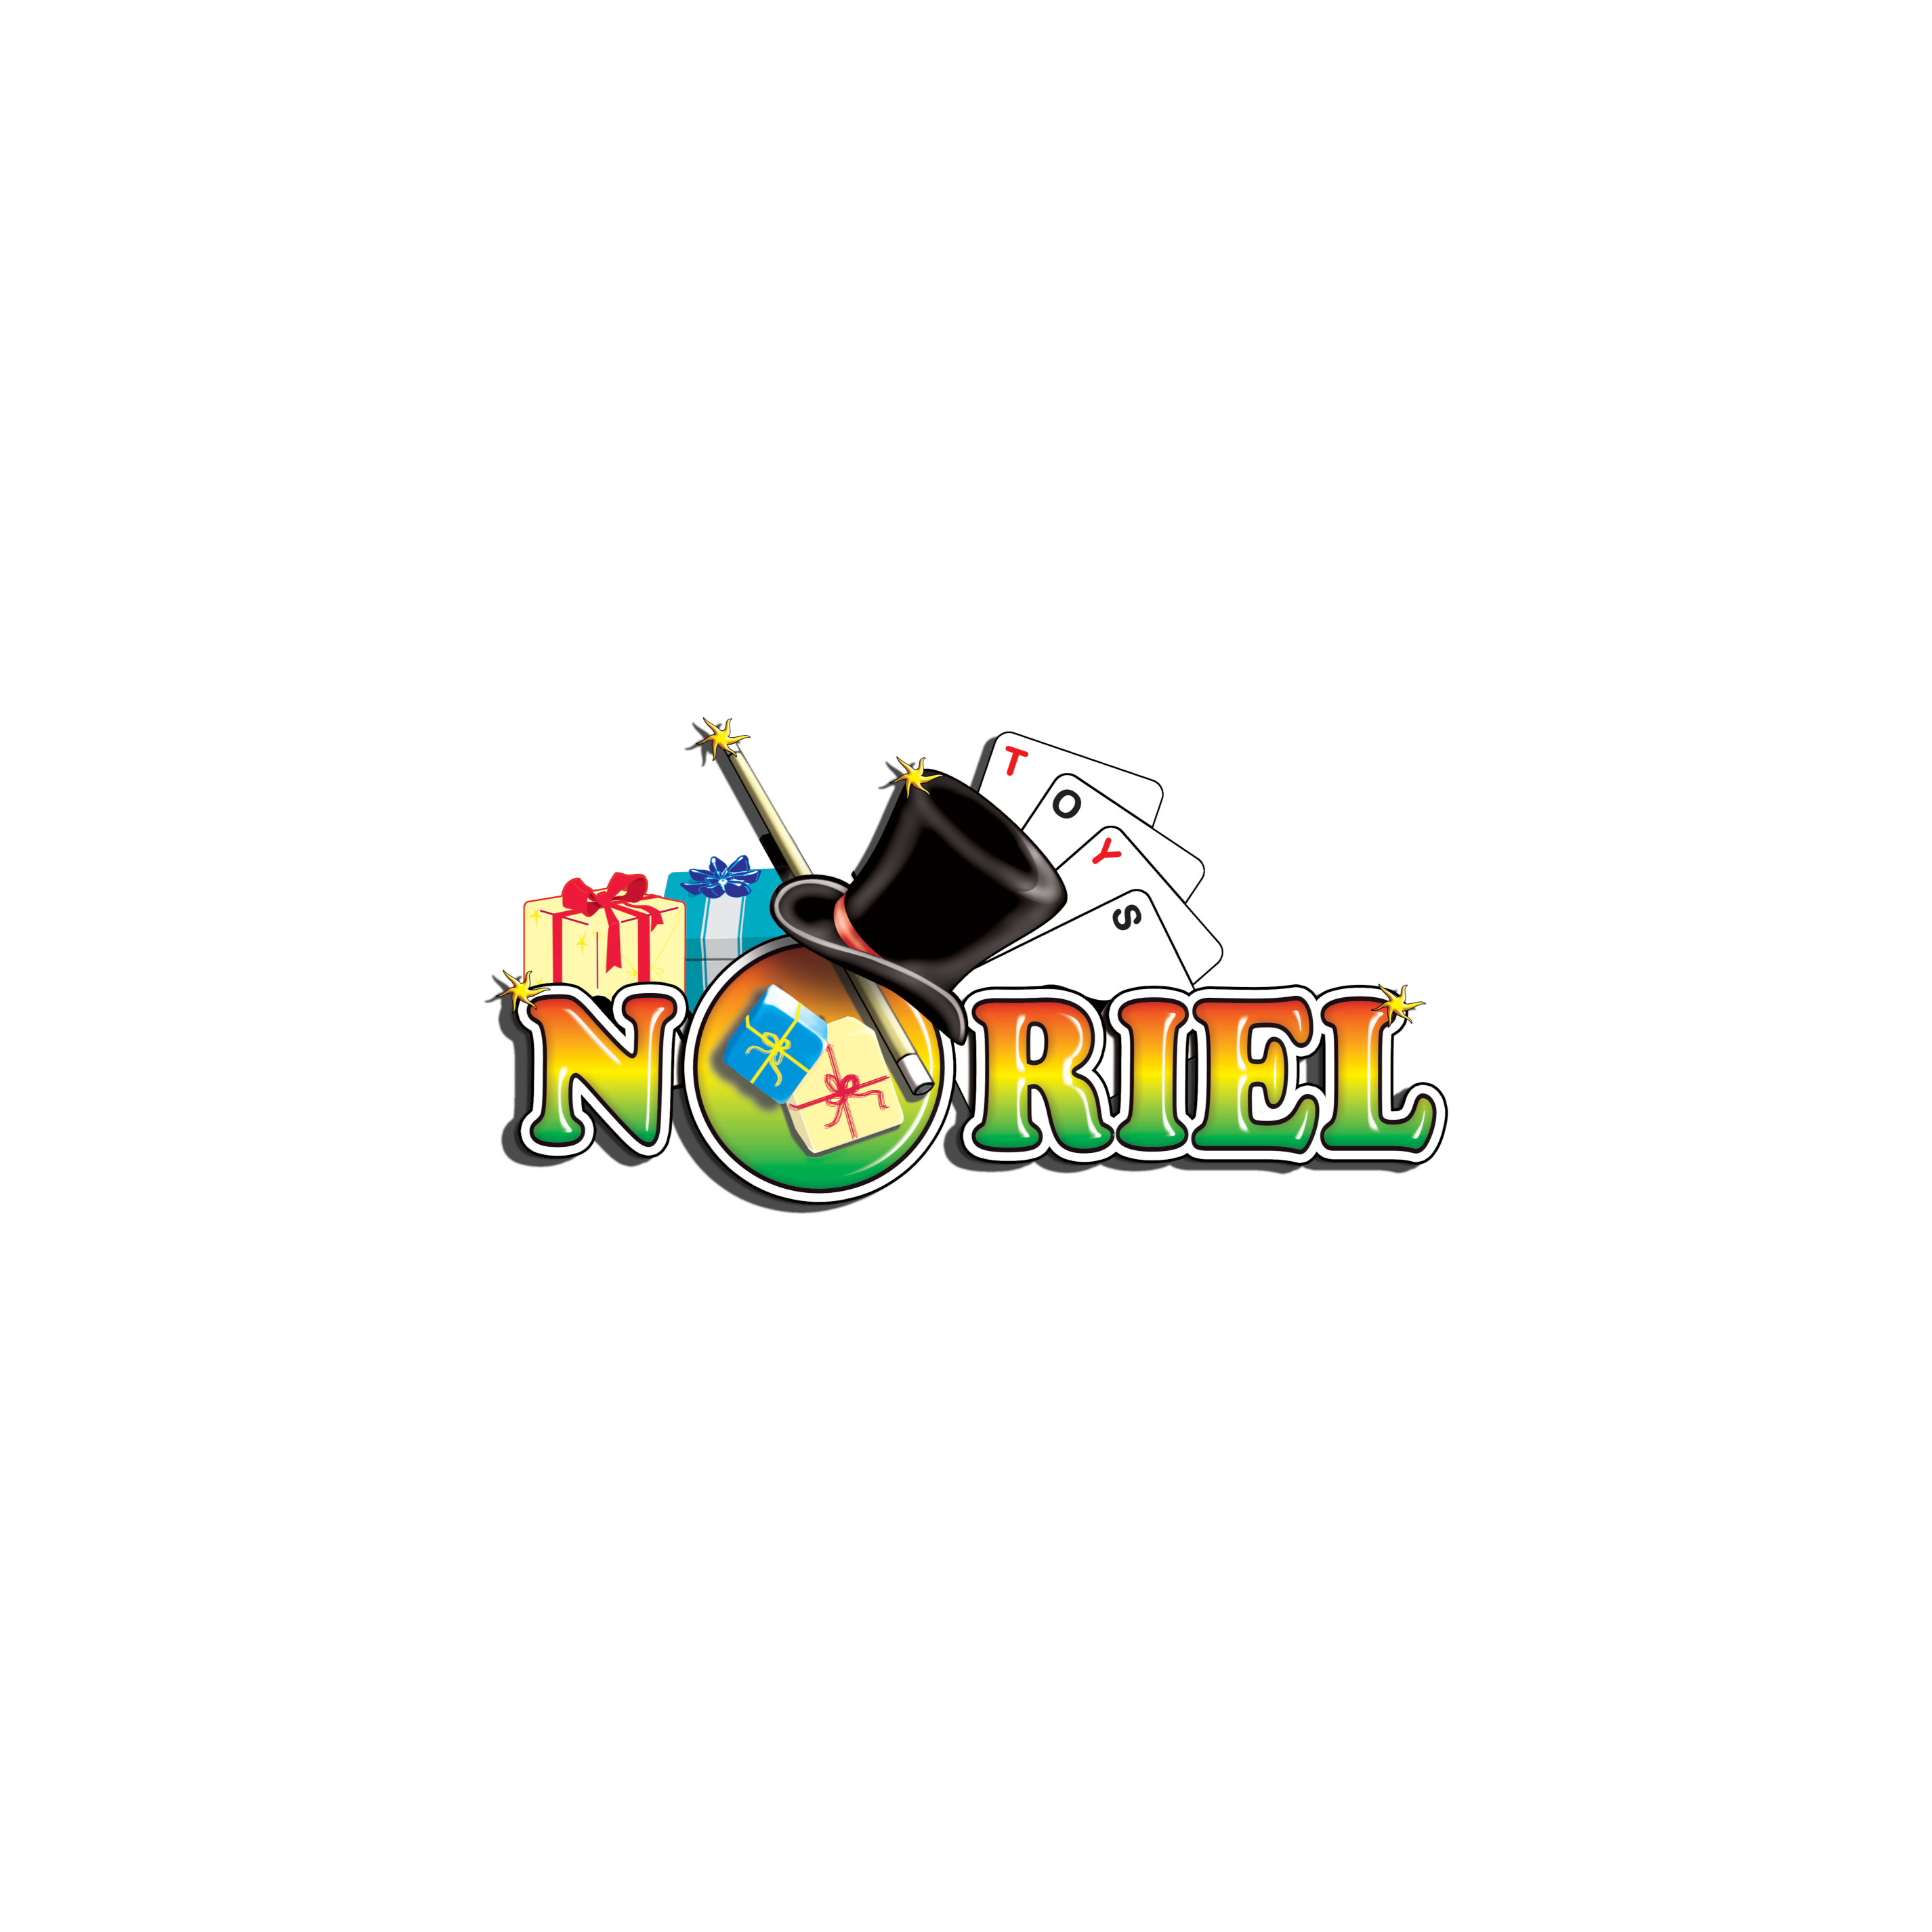 14298_001w Puzzle Trefl Maxi Disney Frozen 2, 24 piese